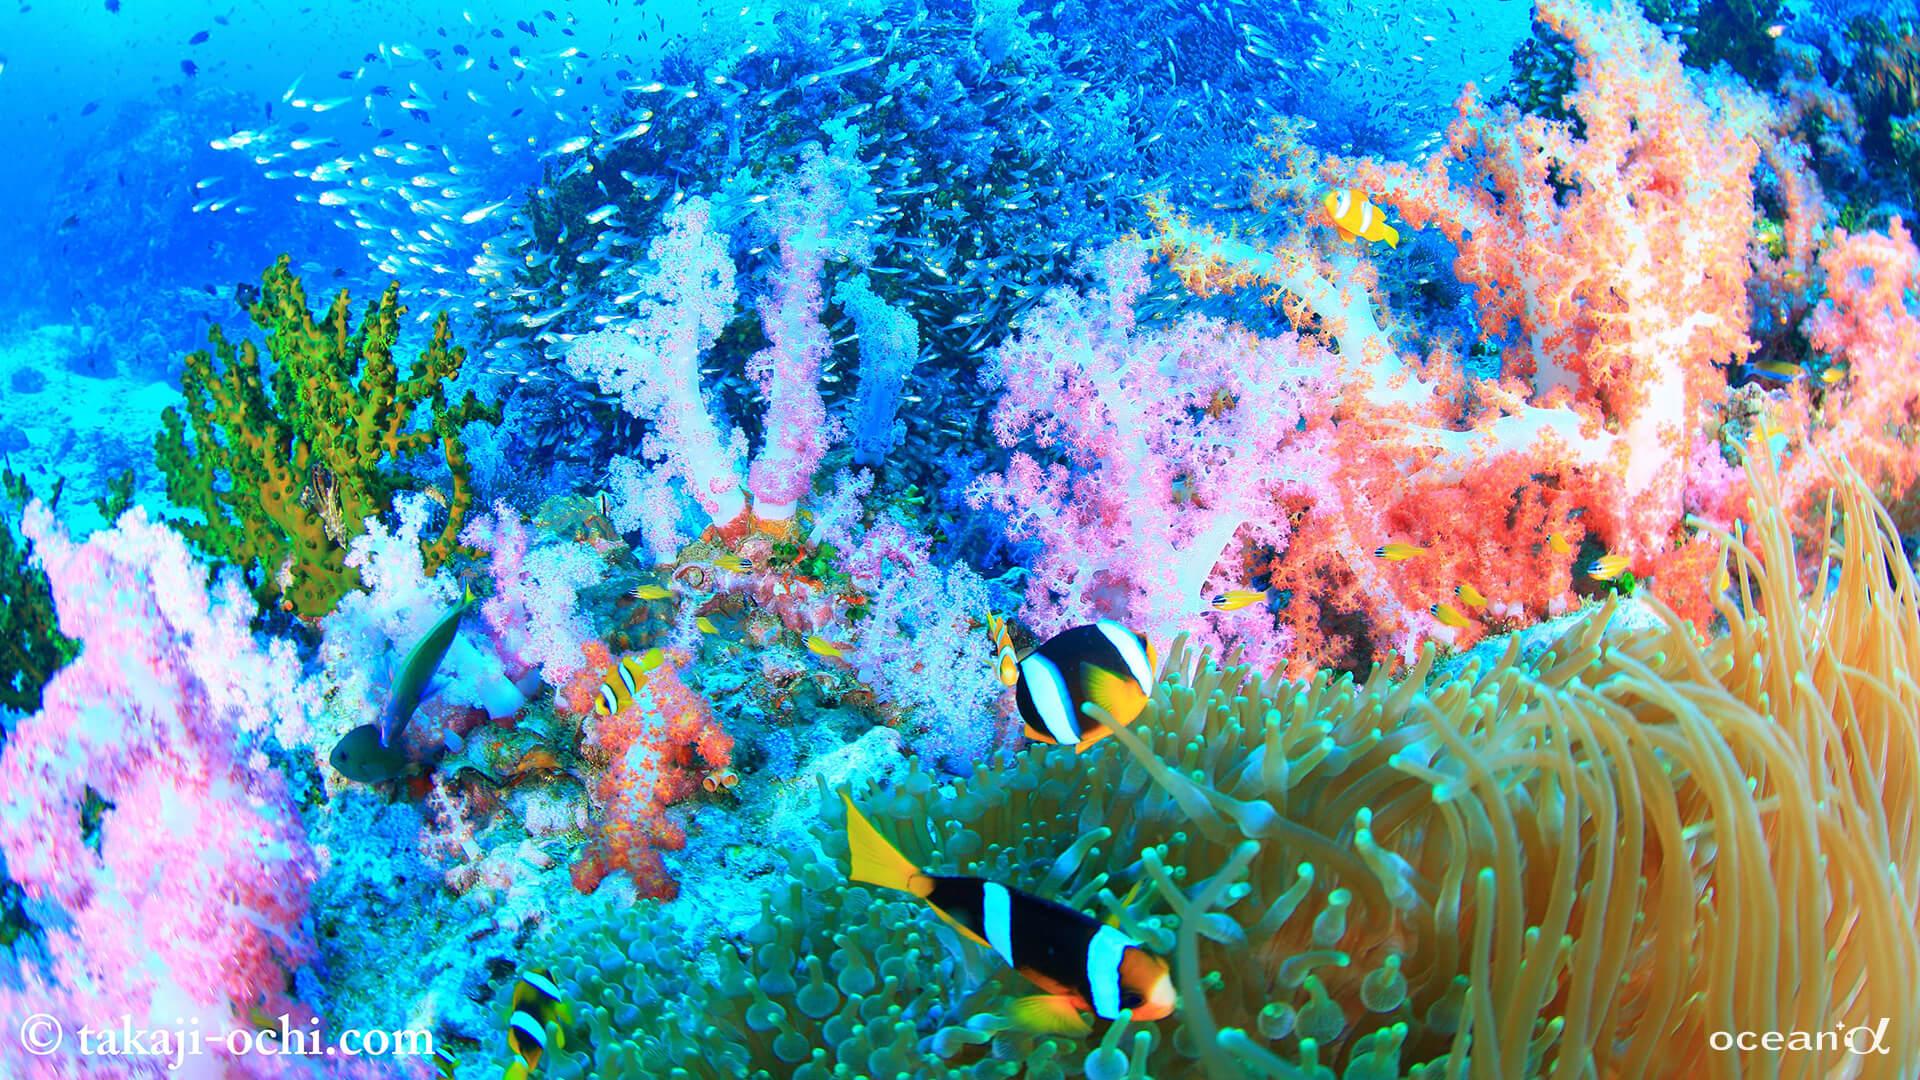 OCEAN+αオンライン背景用画像提供サービス